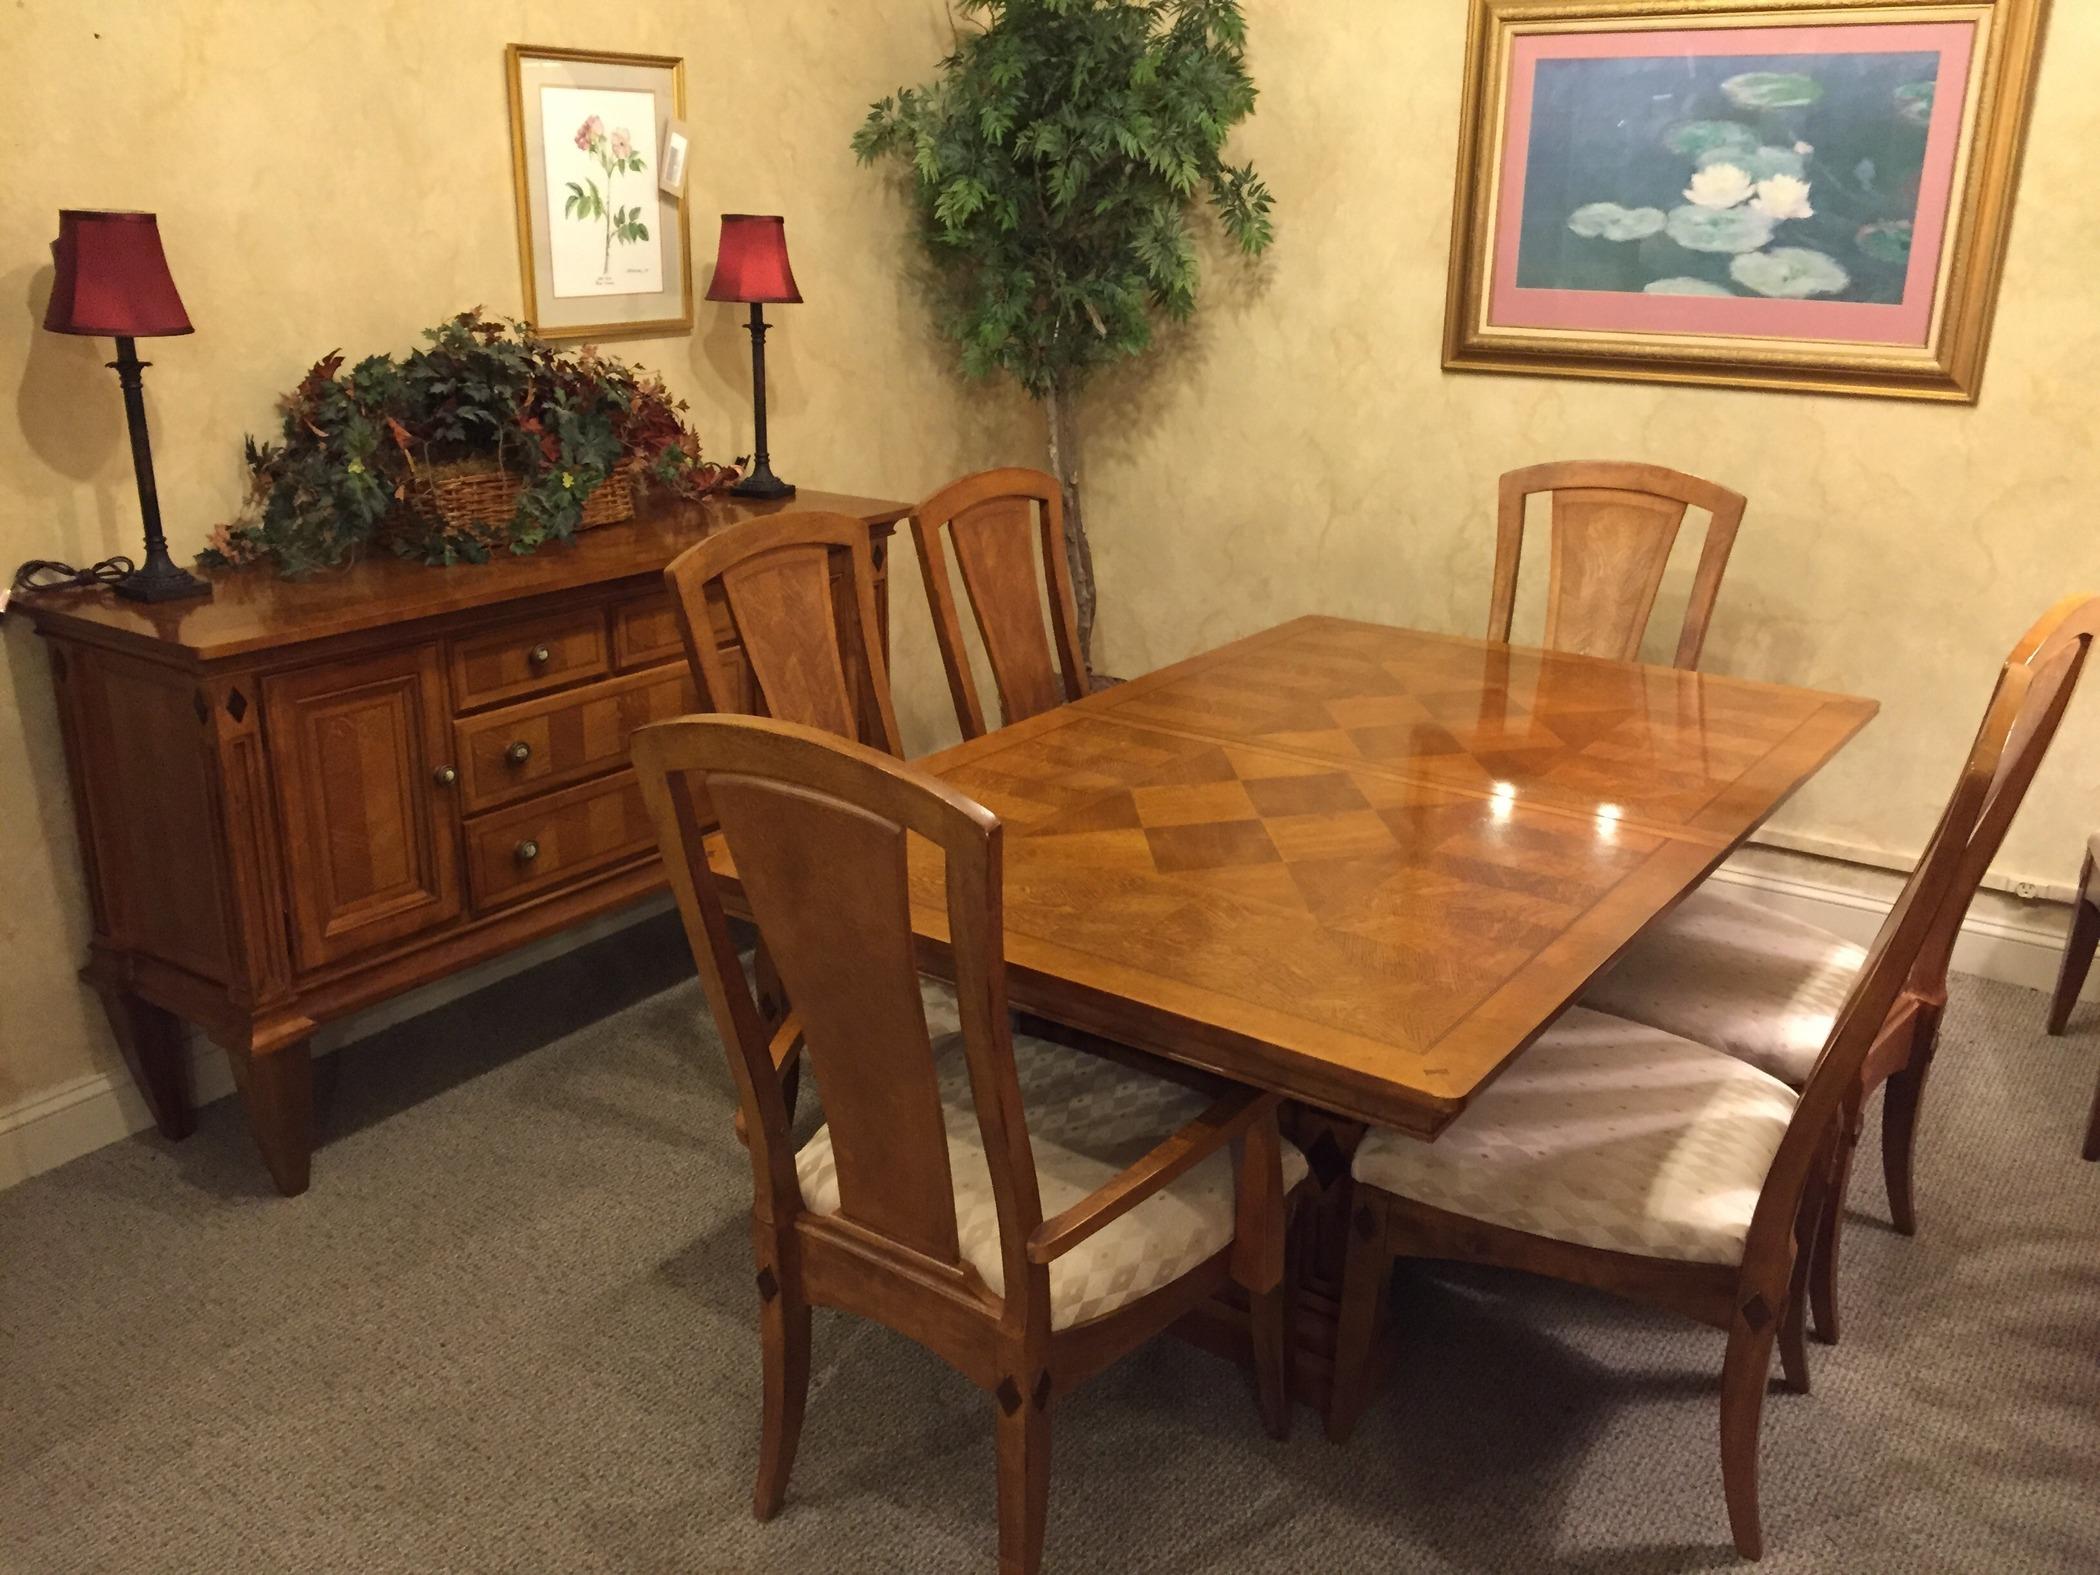 Medium image. ALEXANDER JULIAN DINING ROOM   Allegheny Furniture Consignment